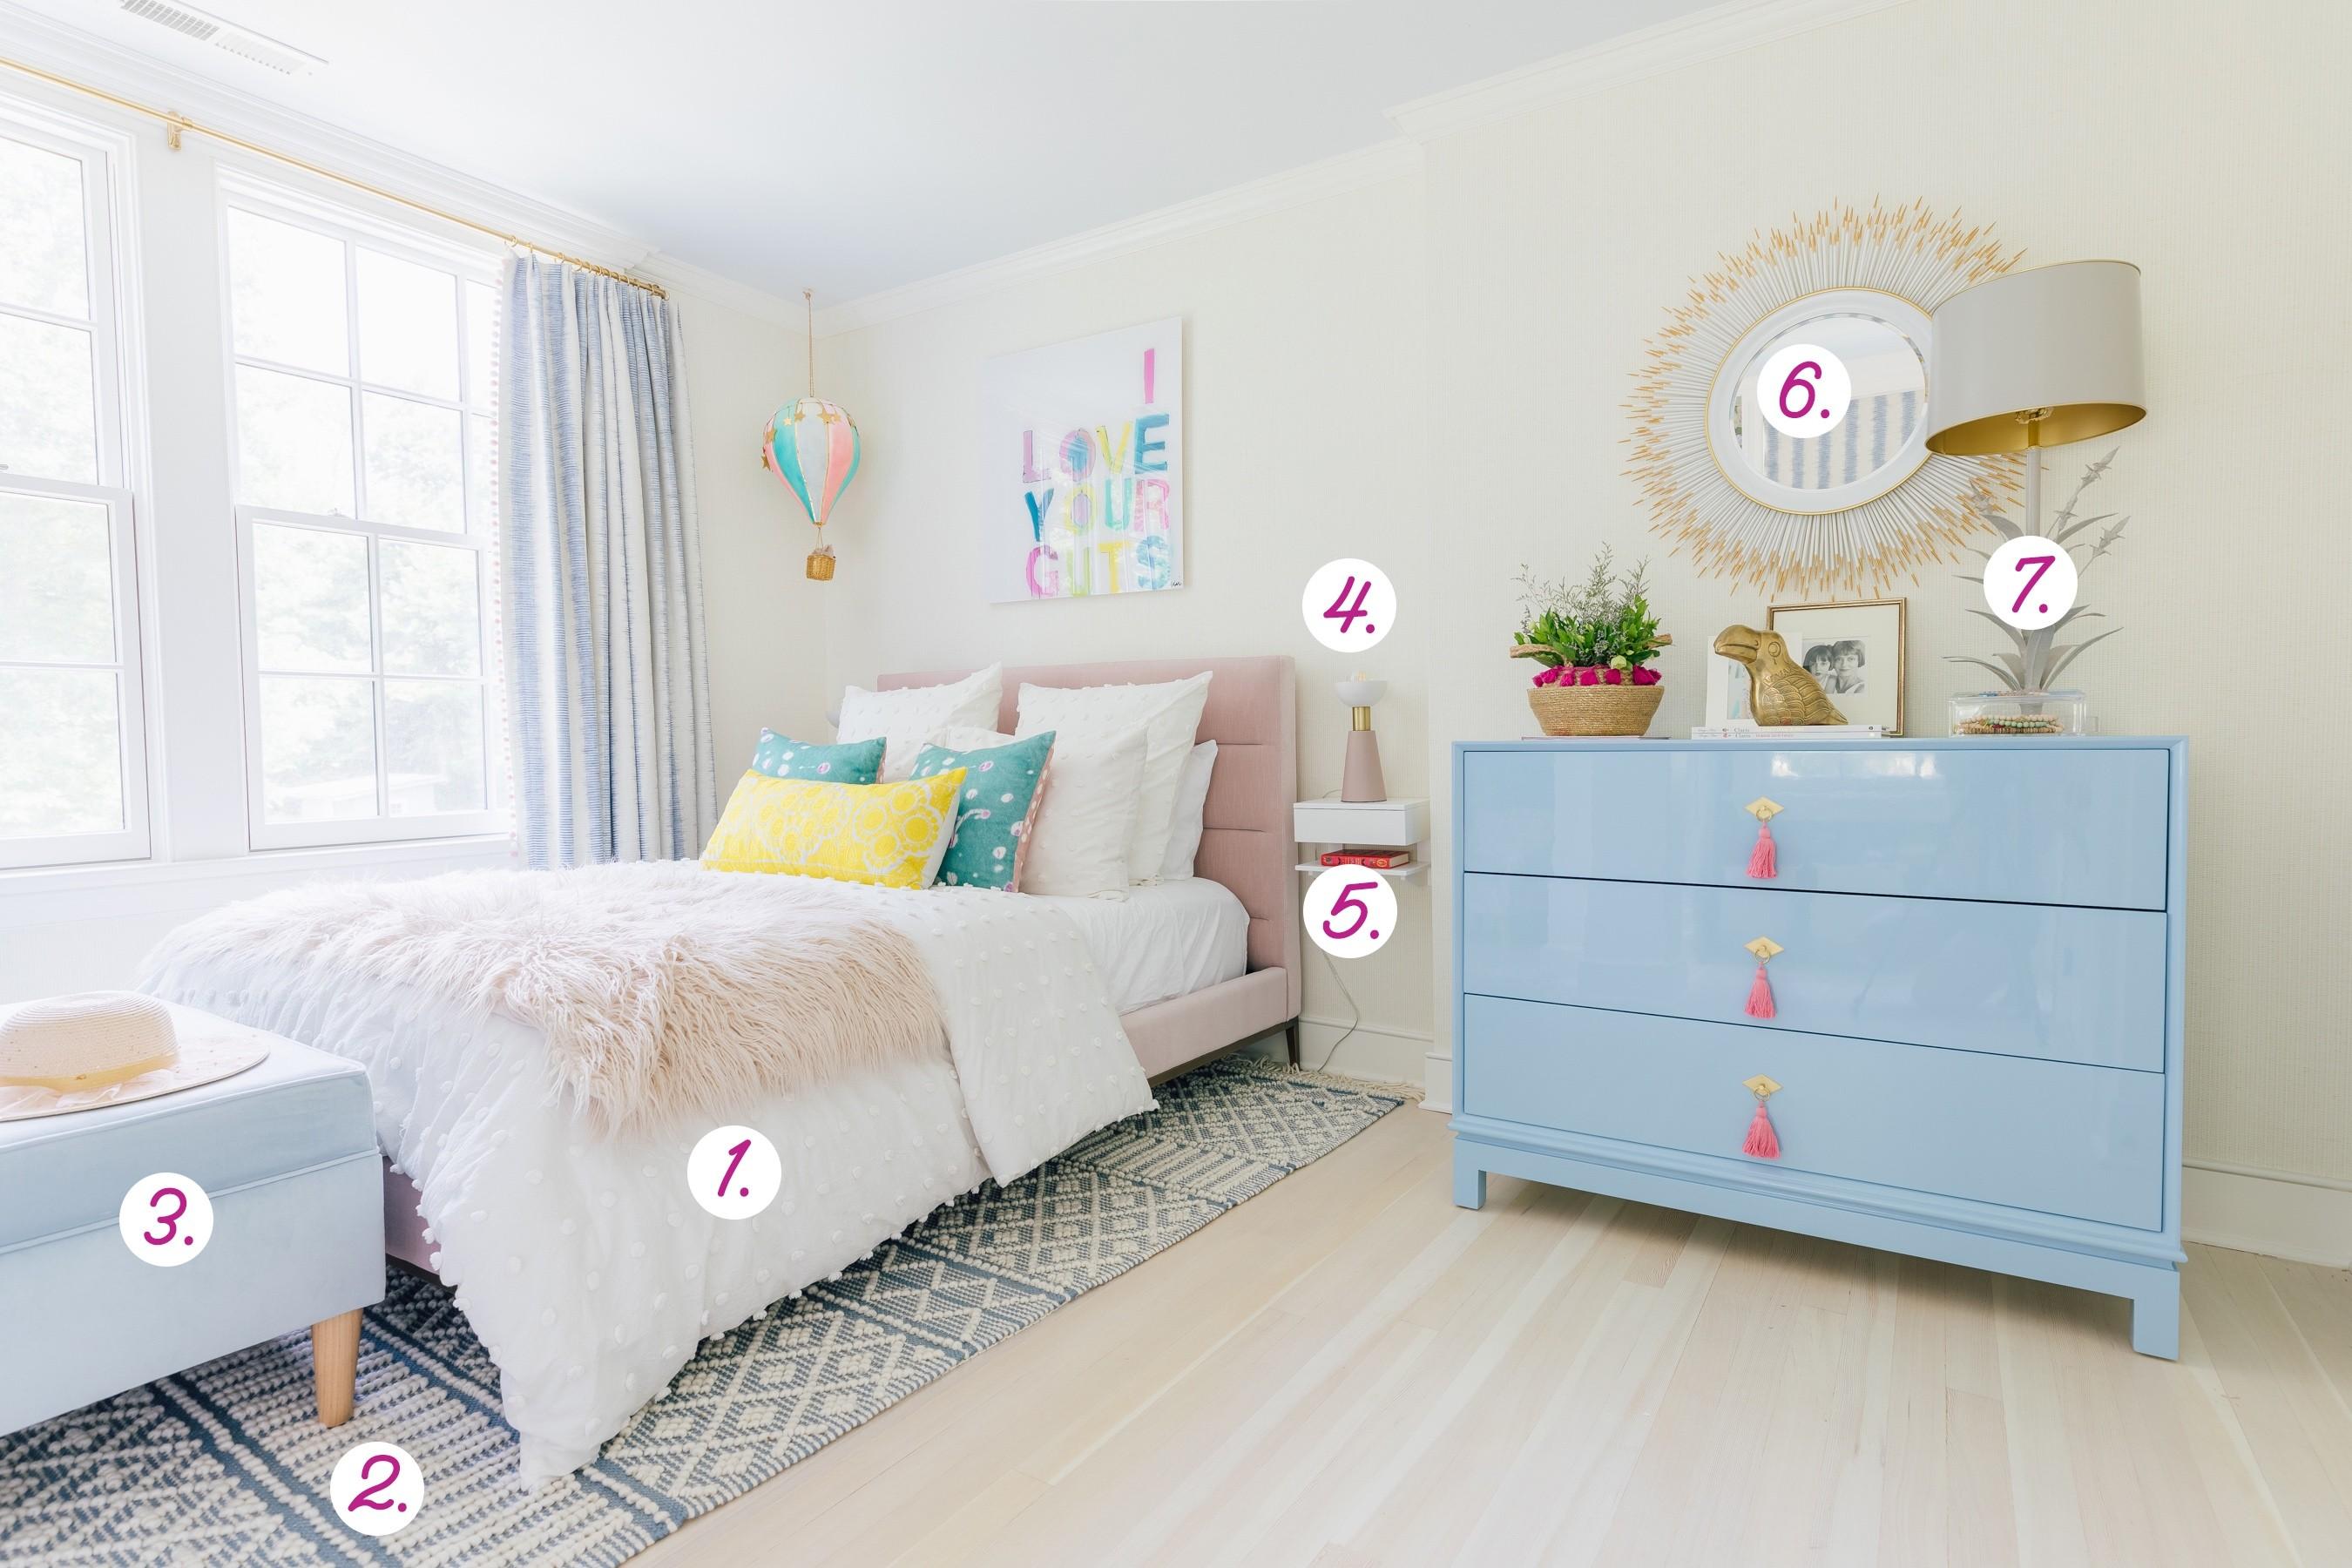 Strange Marlowes Bedroom Reveal Happily Eva After Andrewgaddart Wooden Chair Designs For Living Room Andrewgaddartcom